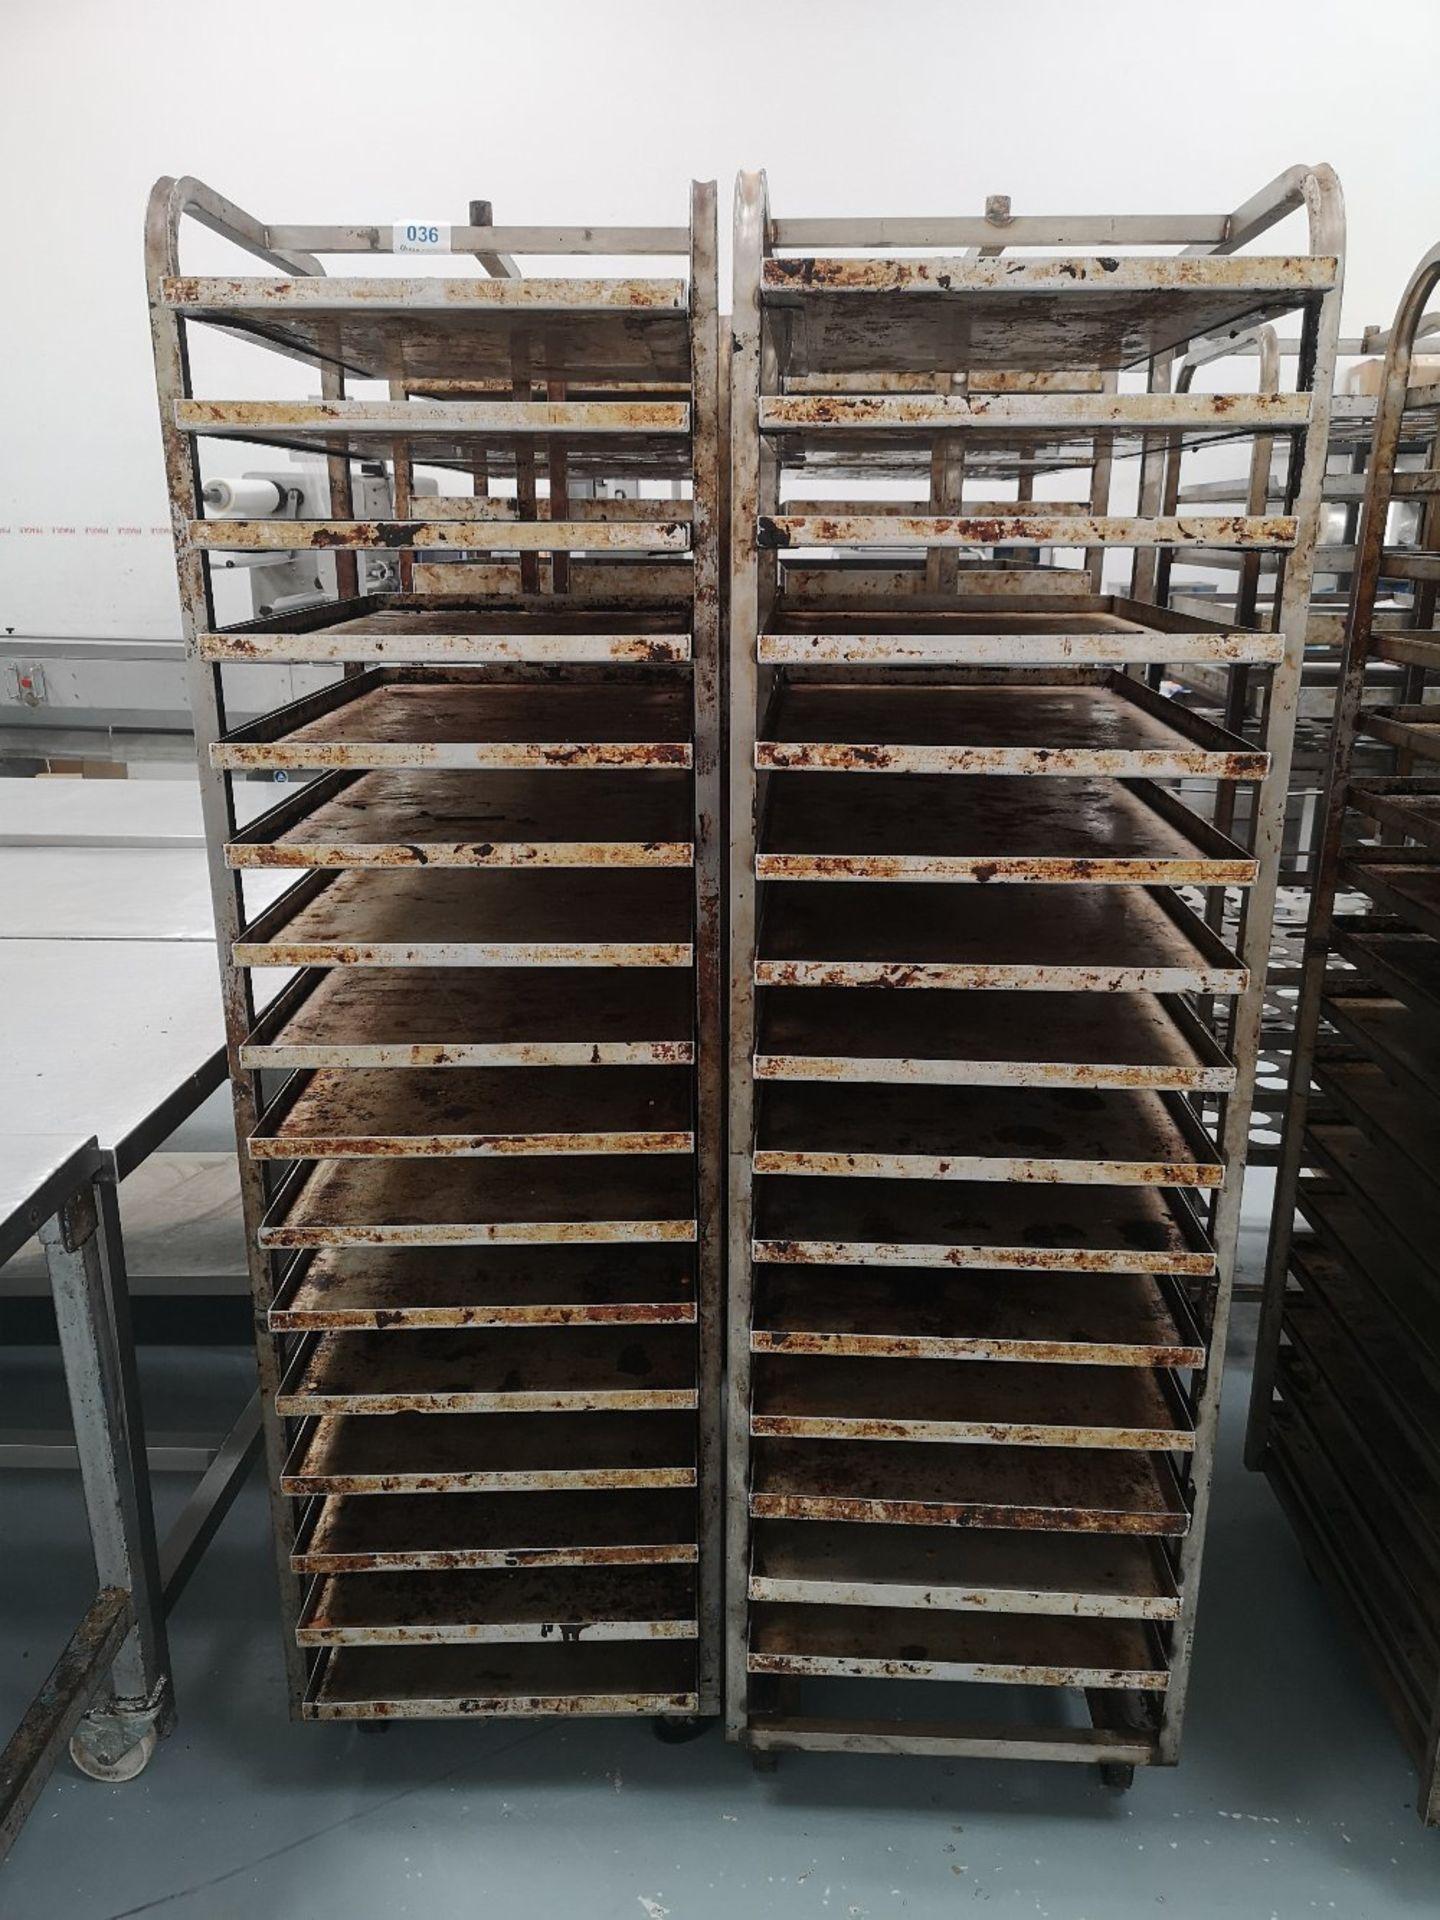 (2) Sixteen Slot Bakery Rack/Tray Stainless Steel Trollies